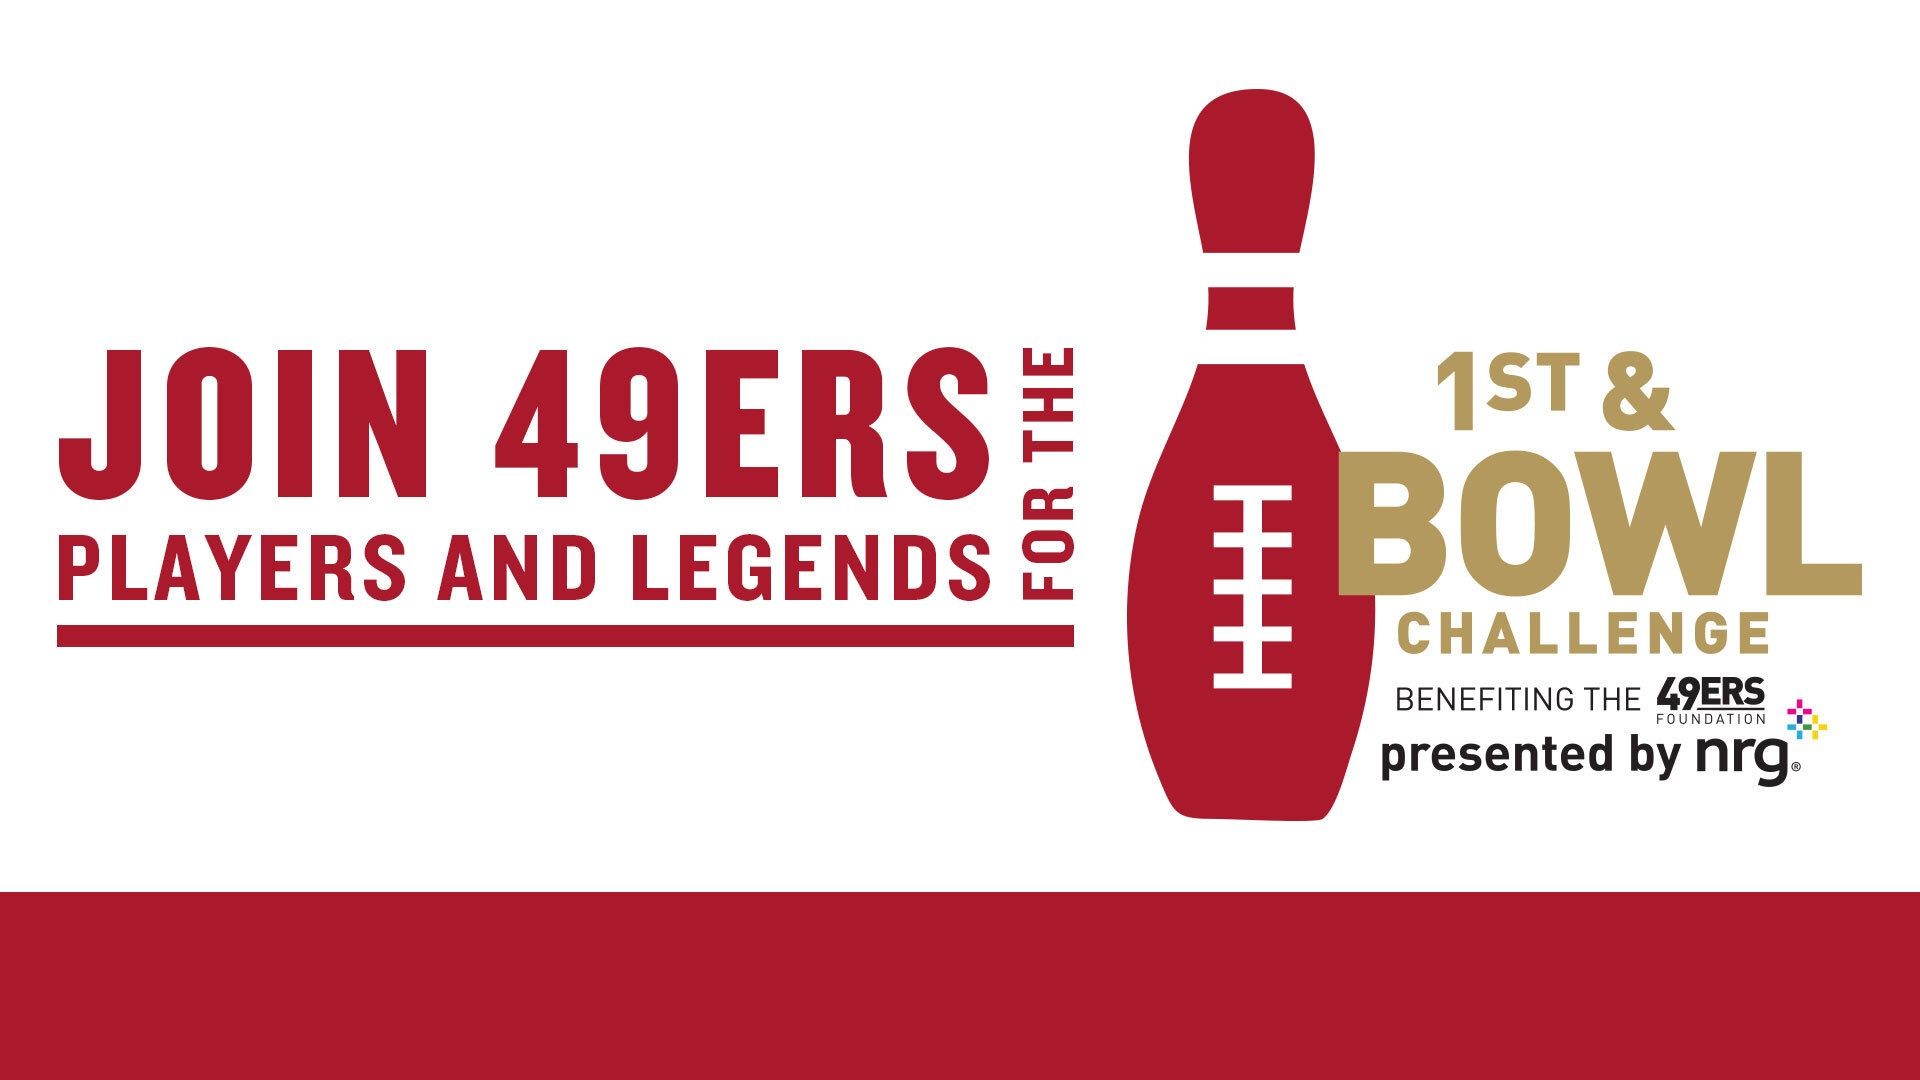 1st & Bowl Challenge